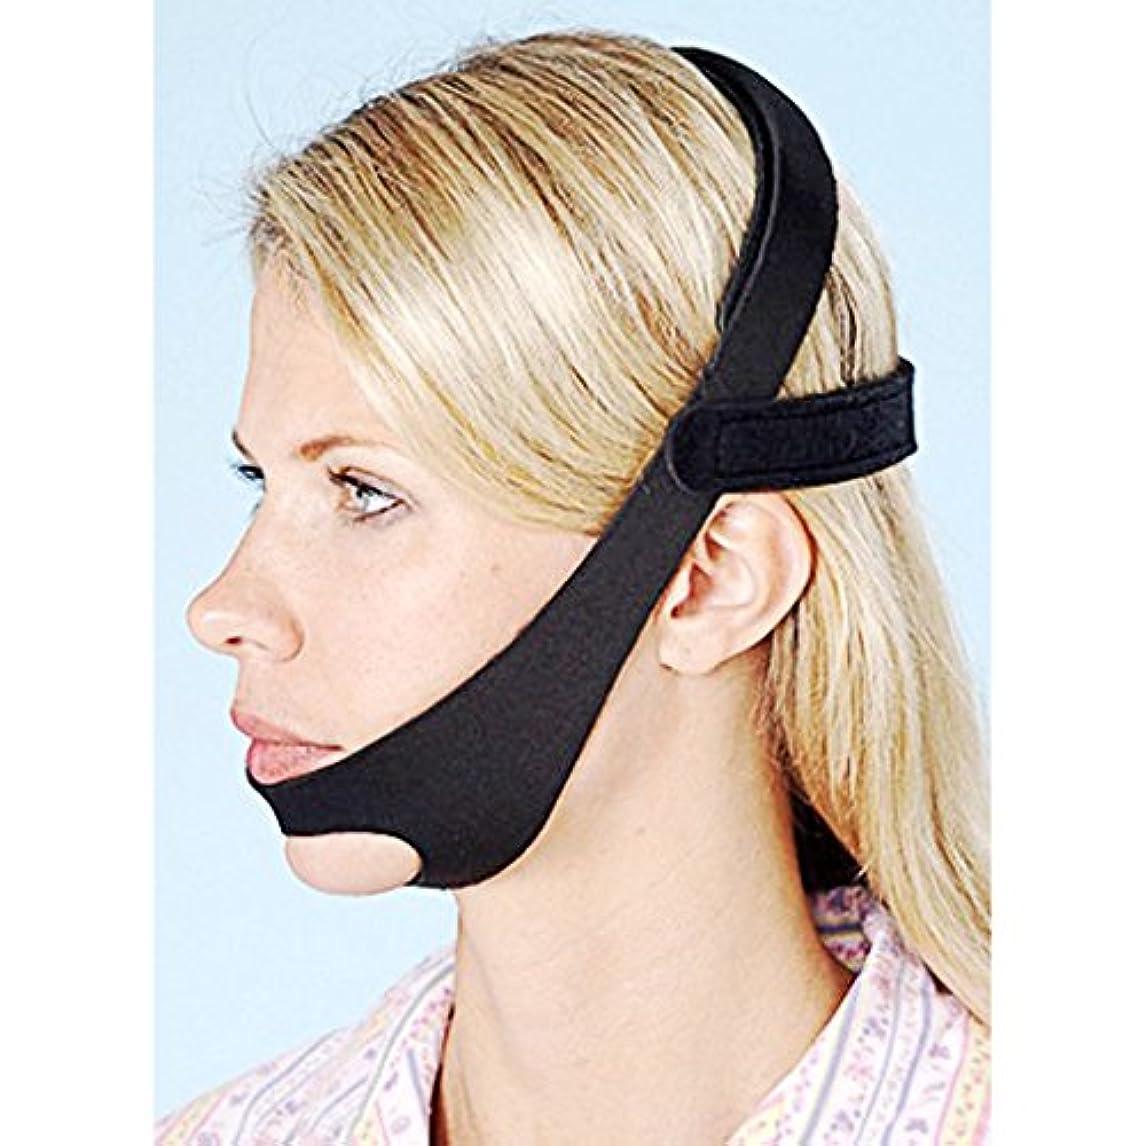 DH 2018新しくいびき予防|調整可能なアンチSnoringチンストラップは、男性と女性のためにいびきのいびきSnore Relief Jaw Support Stop Snoring Solution DAHAN